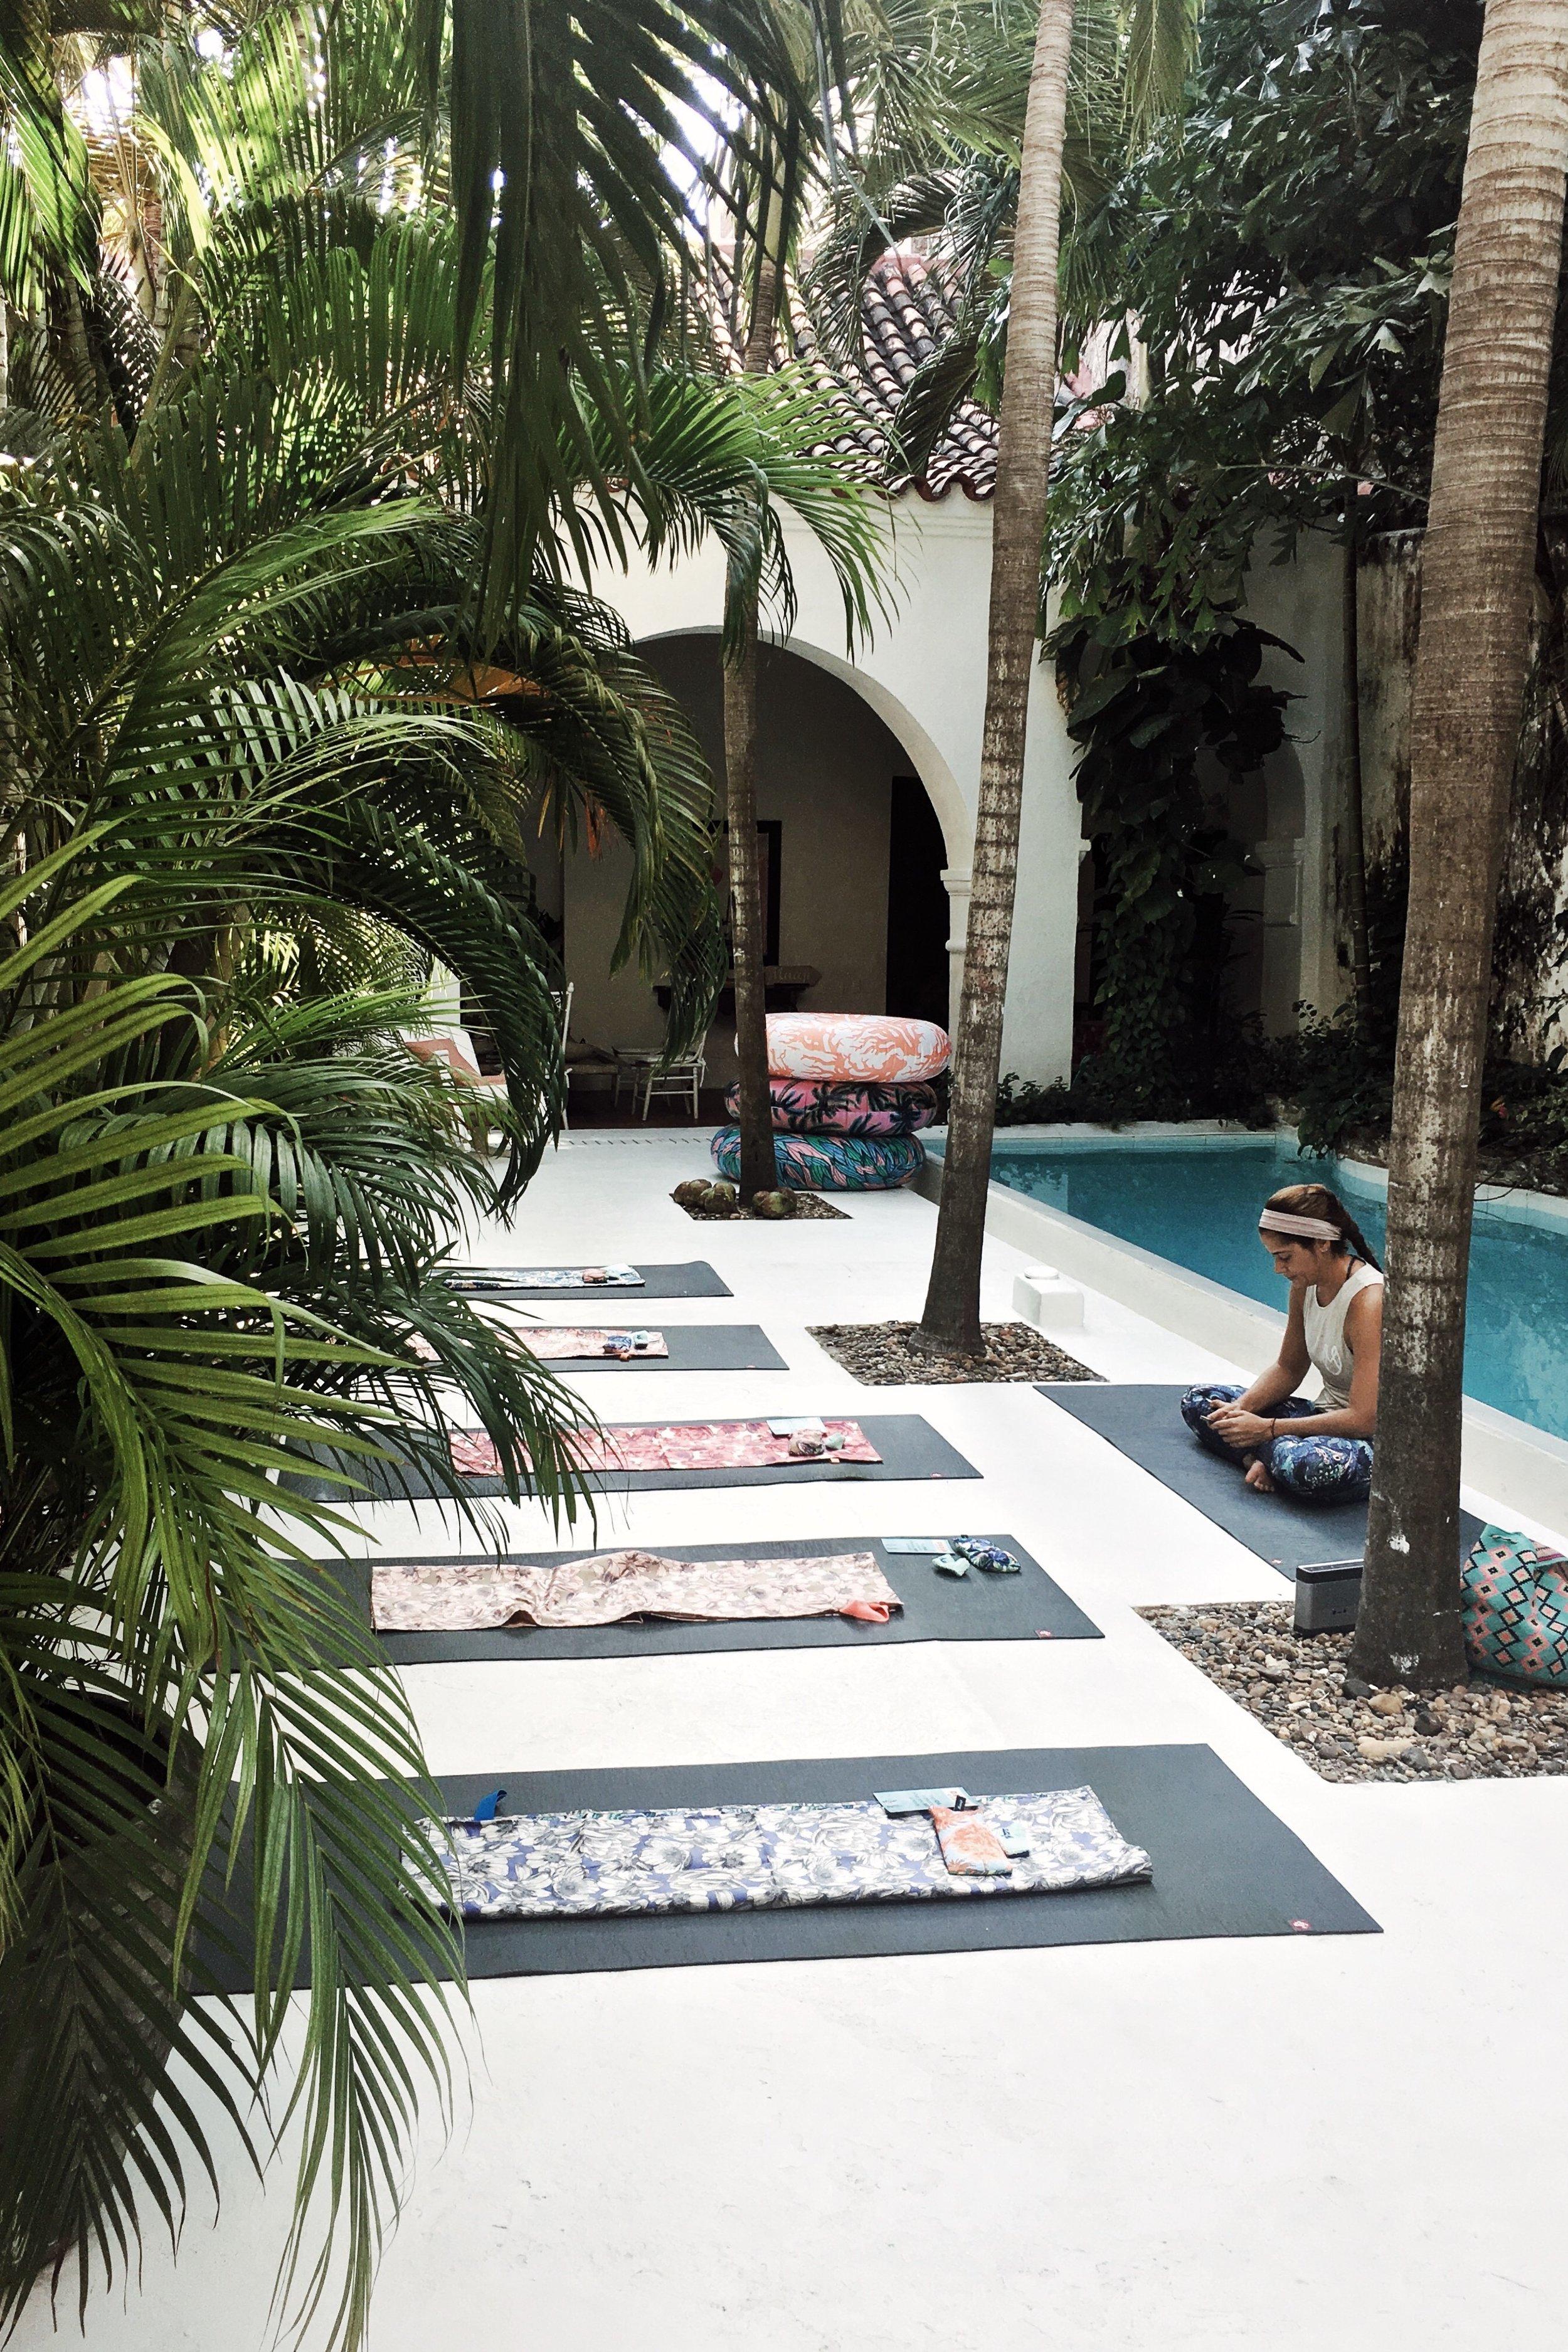 Julia Friedman's trip to Cartagena, Colombia with Maaji Swimwear